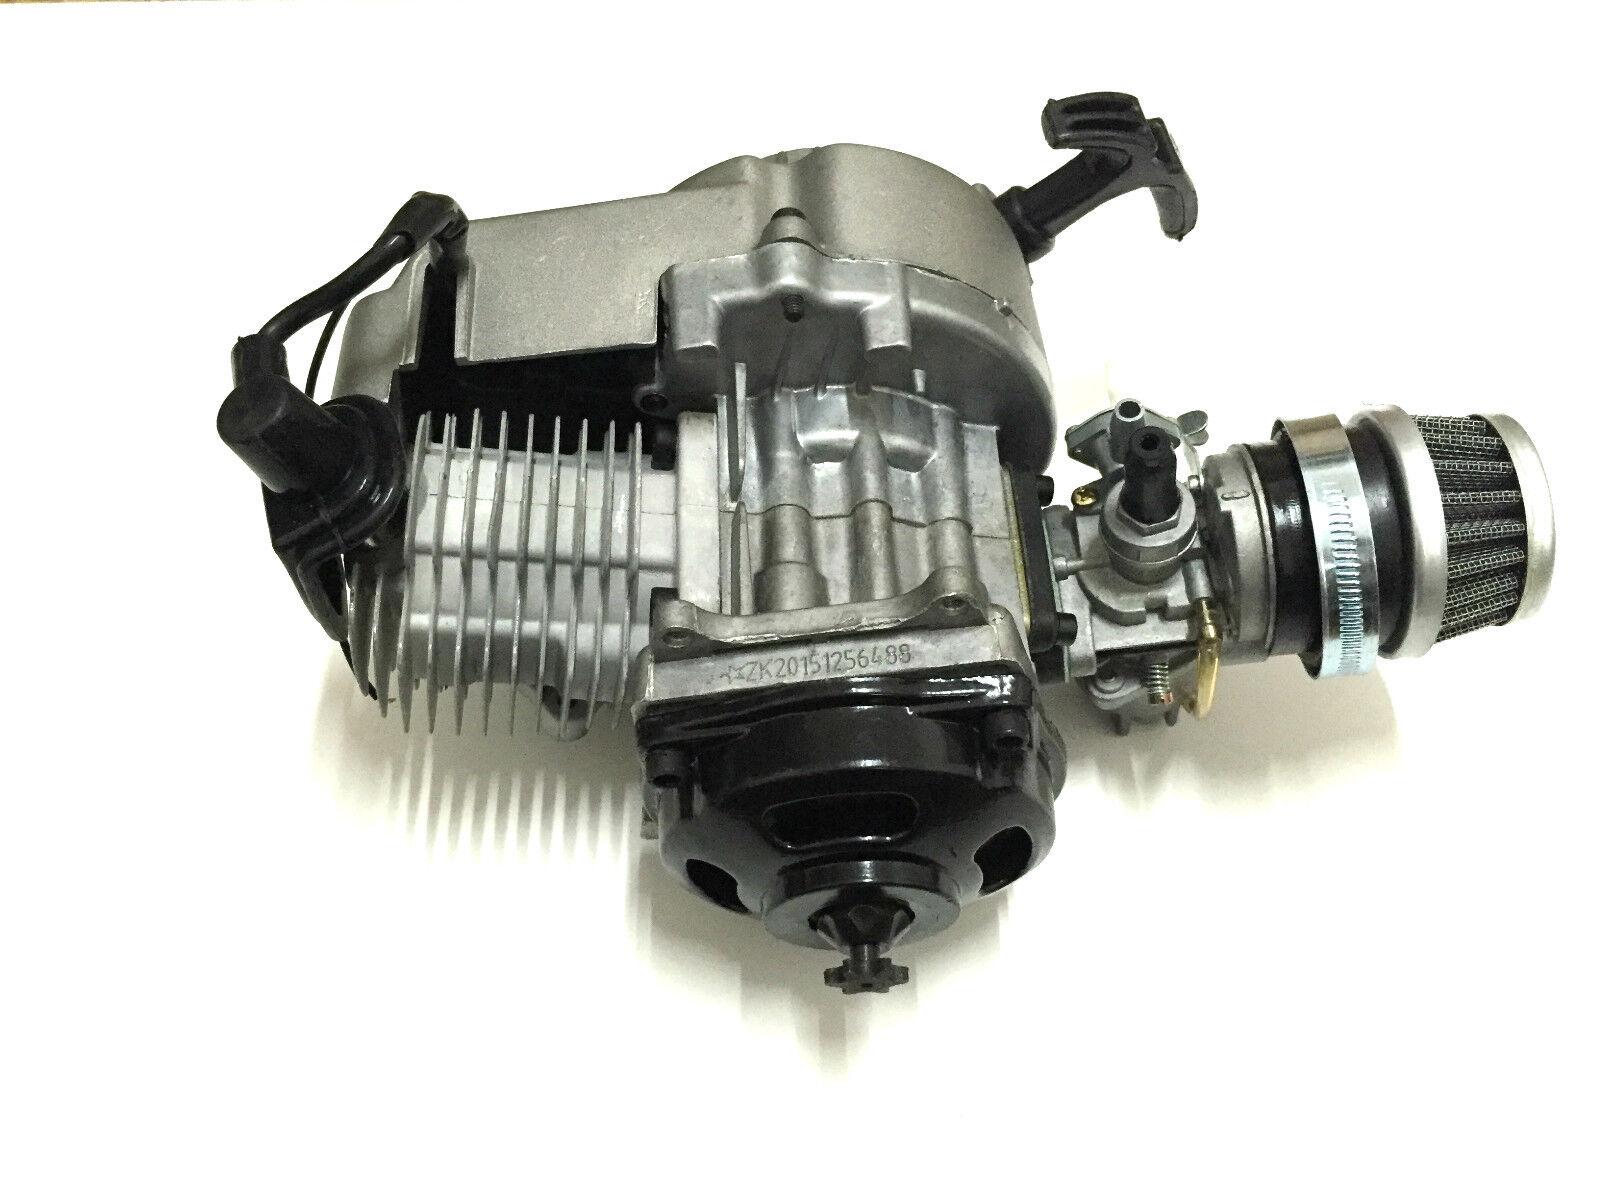 Tuning Motor 60cc Dirt Fahrrad Cross PocketFahrrad Kinderquad Mini Zylinder Vergaser